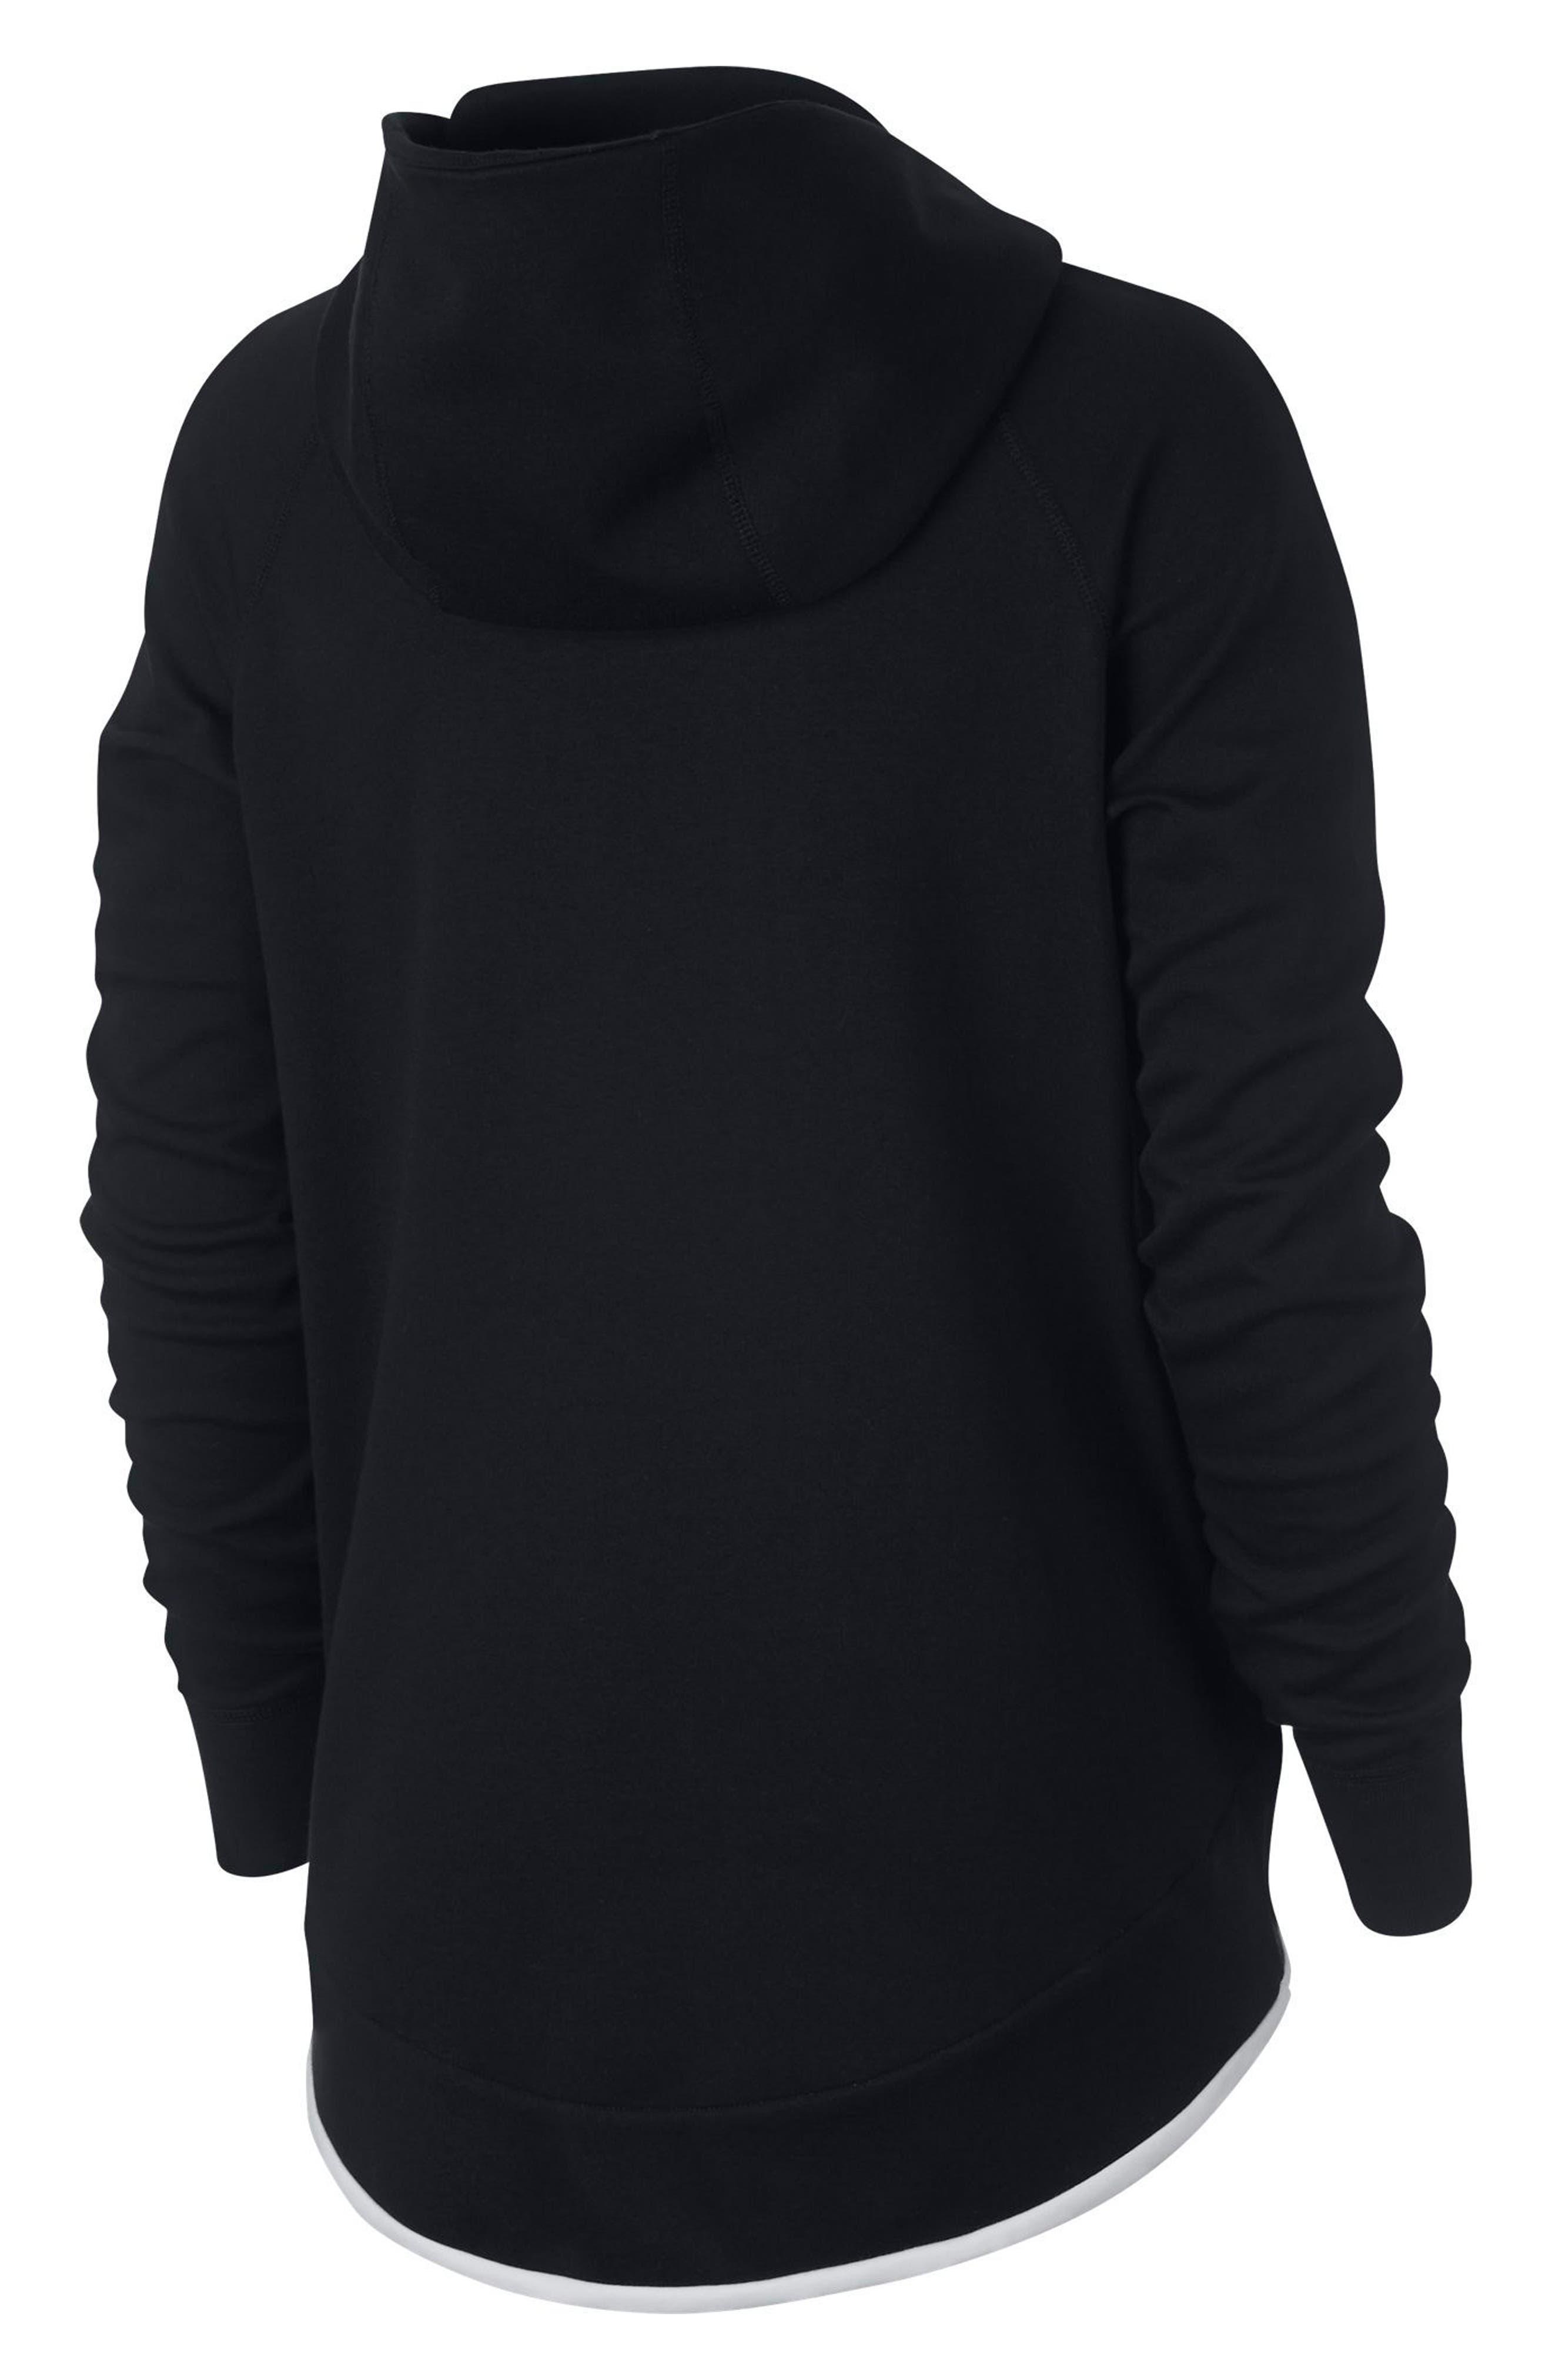 Sportswear Tech Fleece Cape Jacket,                             Alternate thumbnail 8, color,                             BLACK/ WHITE